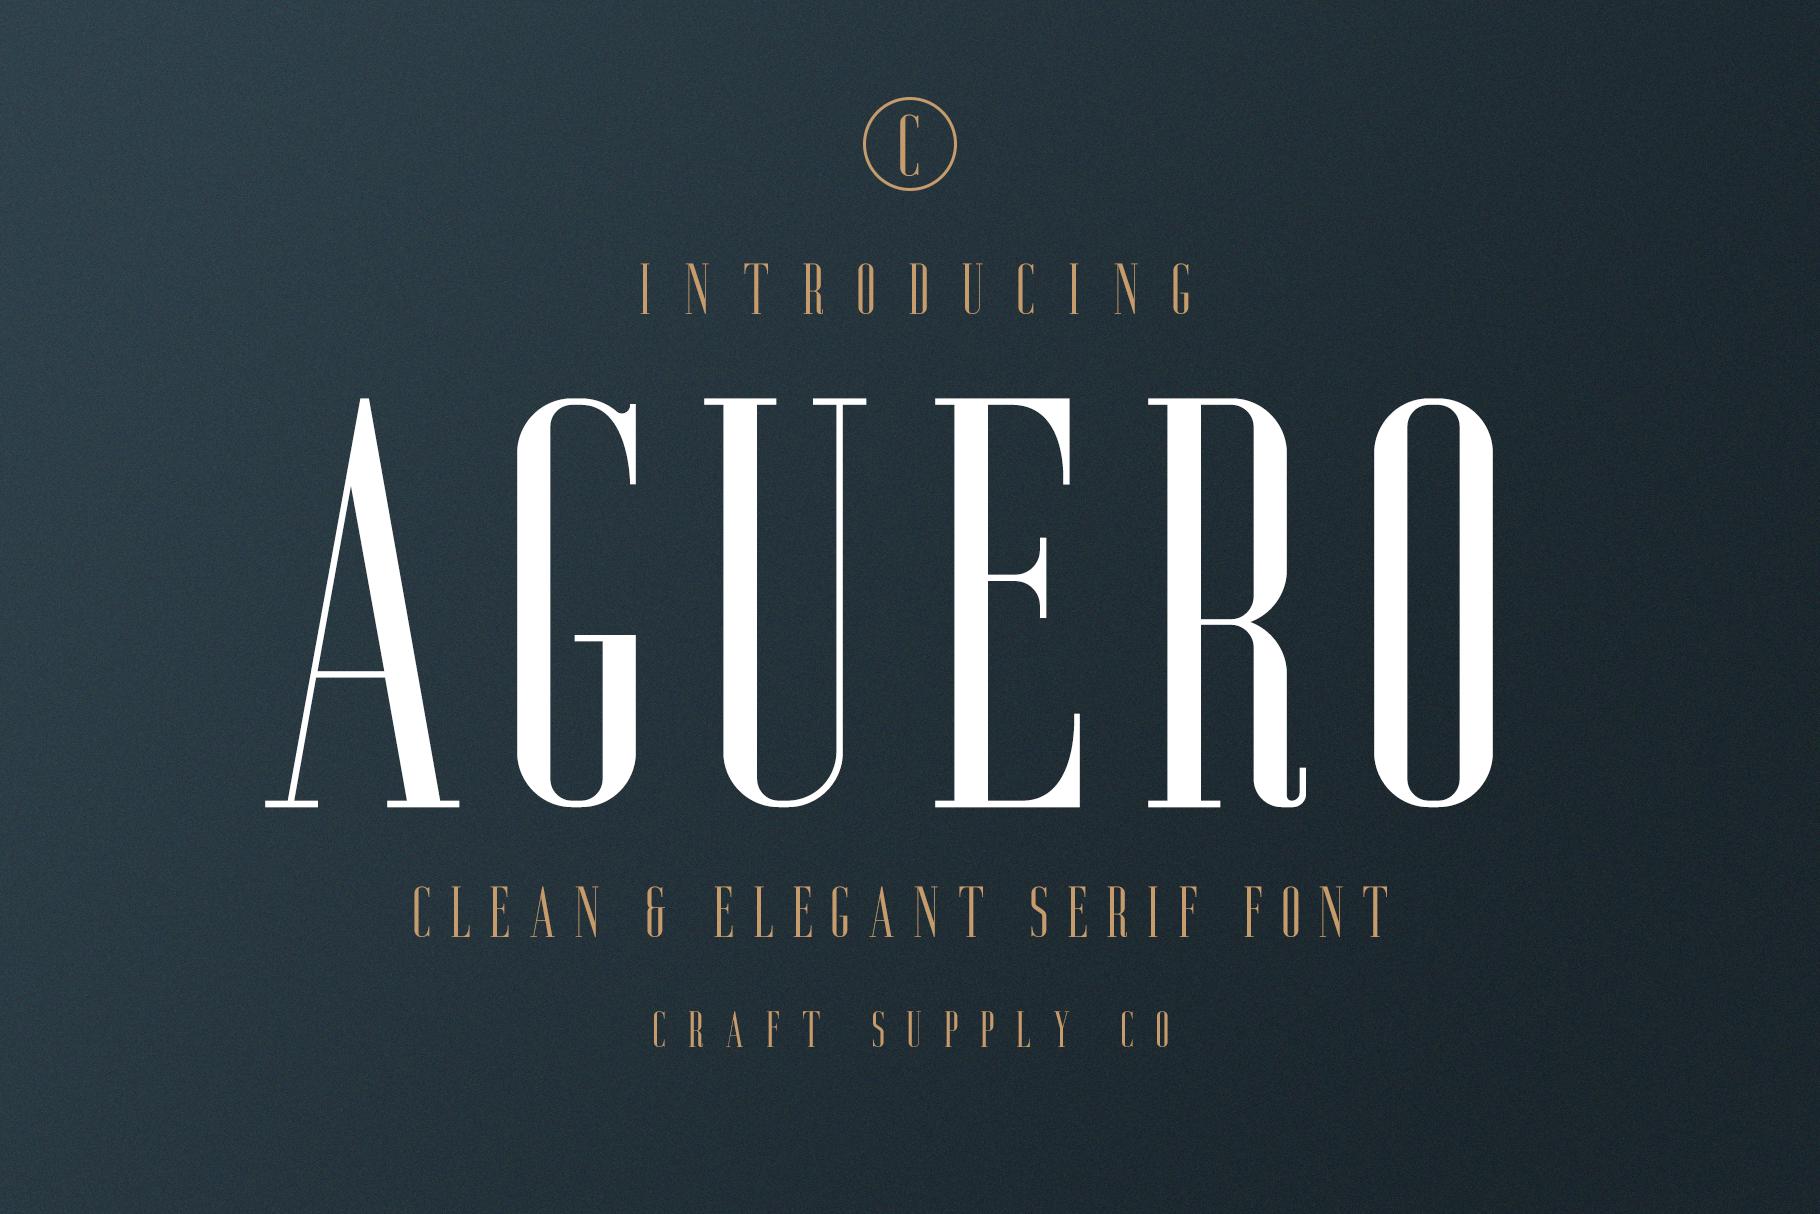 Aguero Serif - Clean & Elegant Font example image 1